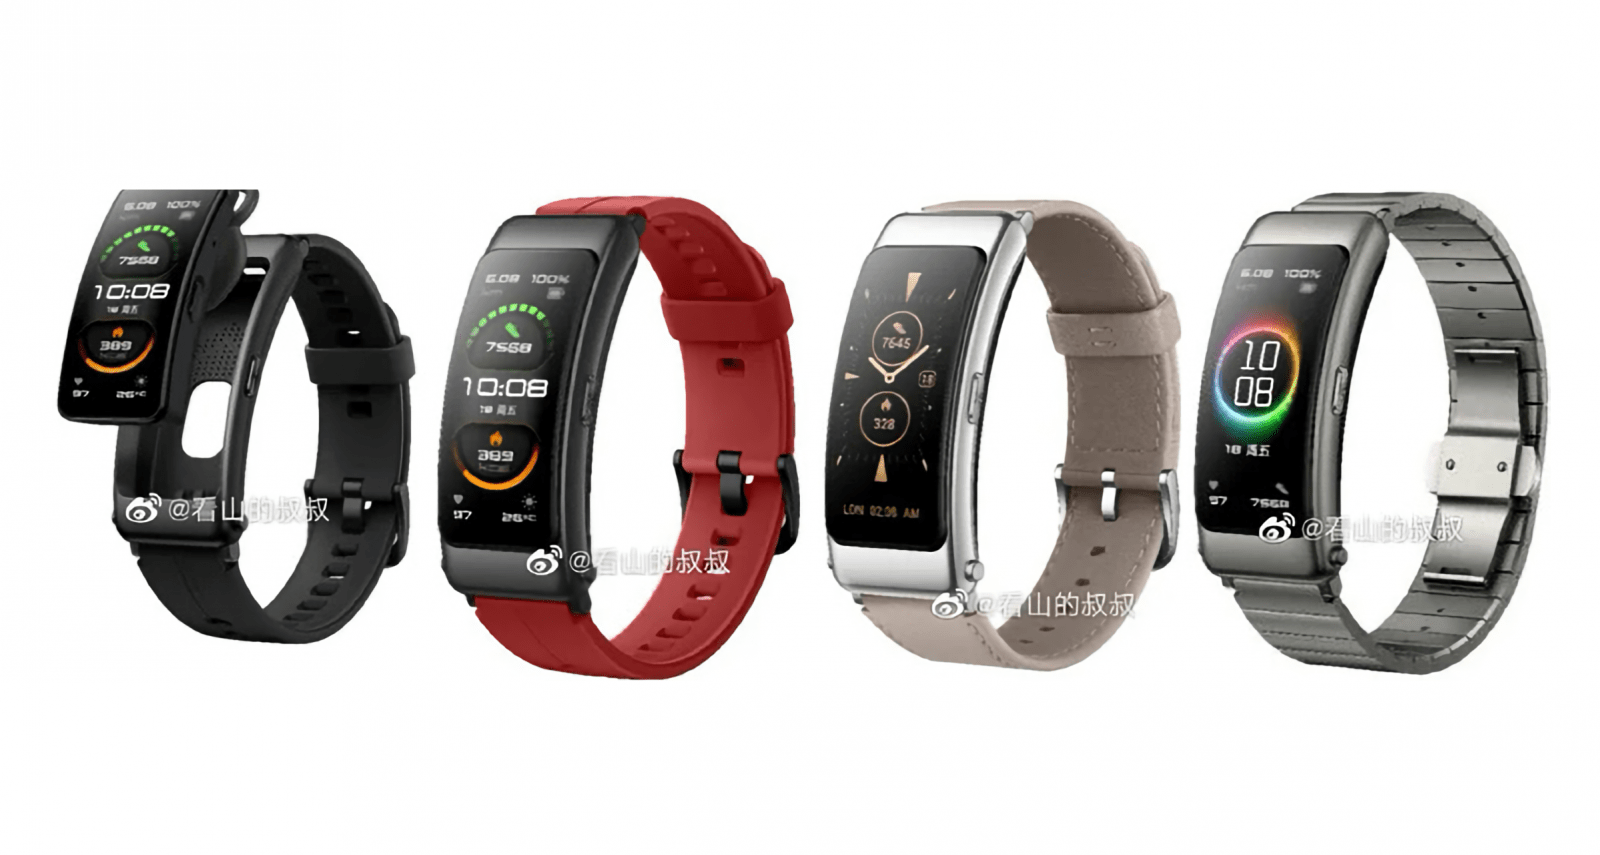 Huawei выпустила фитнес-браслет Huawei TalkBand B6 (huawei talkband b6 launch date)